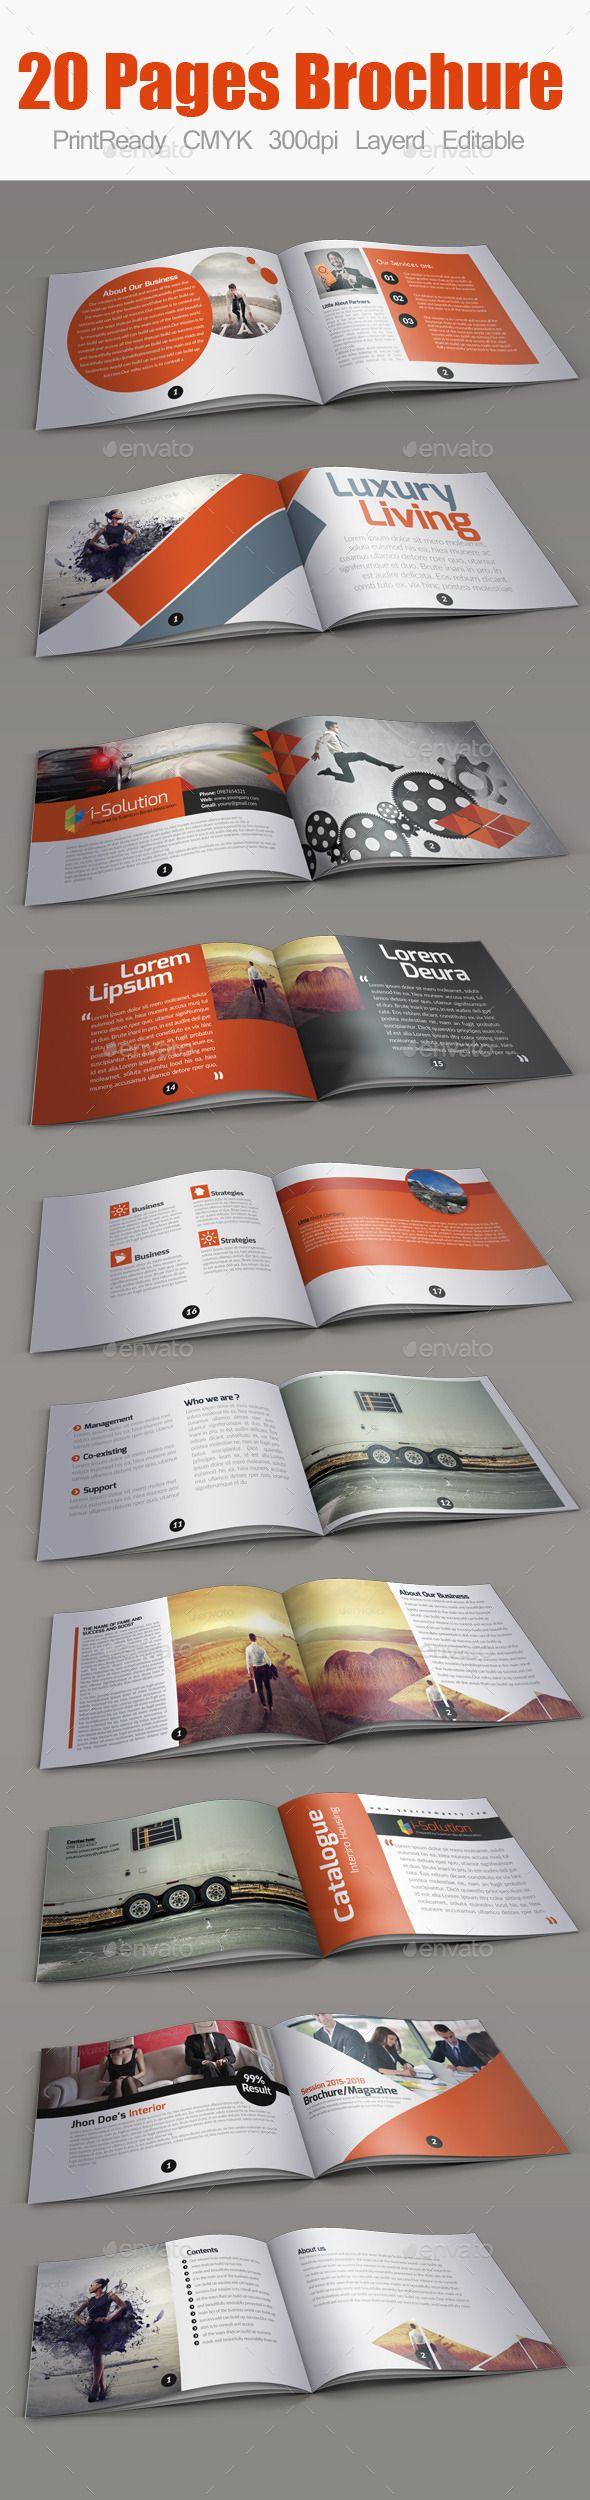 Multiuse Minimal Square Brochure Template #design Download: http://graphicriver.net/item/-multiuse-minimal-square-brochure/10359540?ref=ksioks